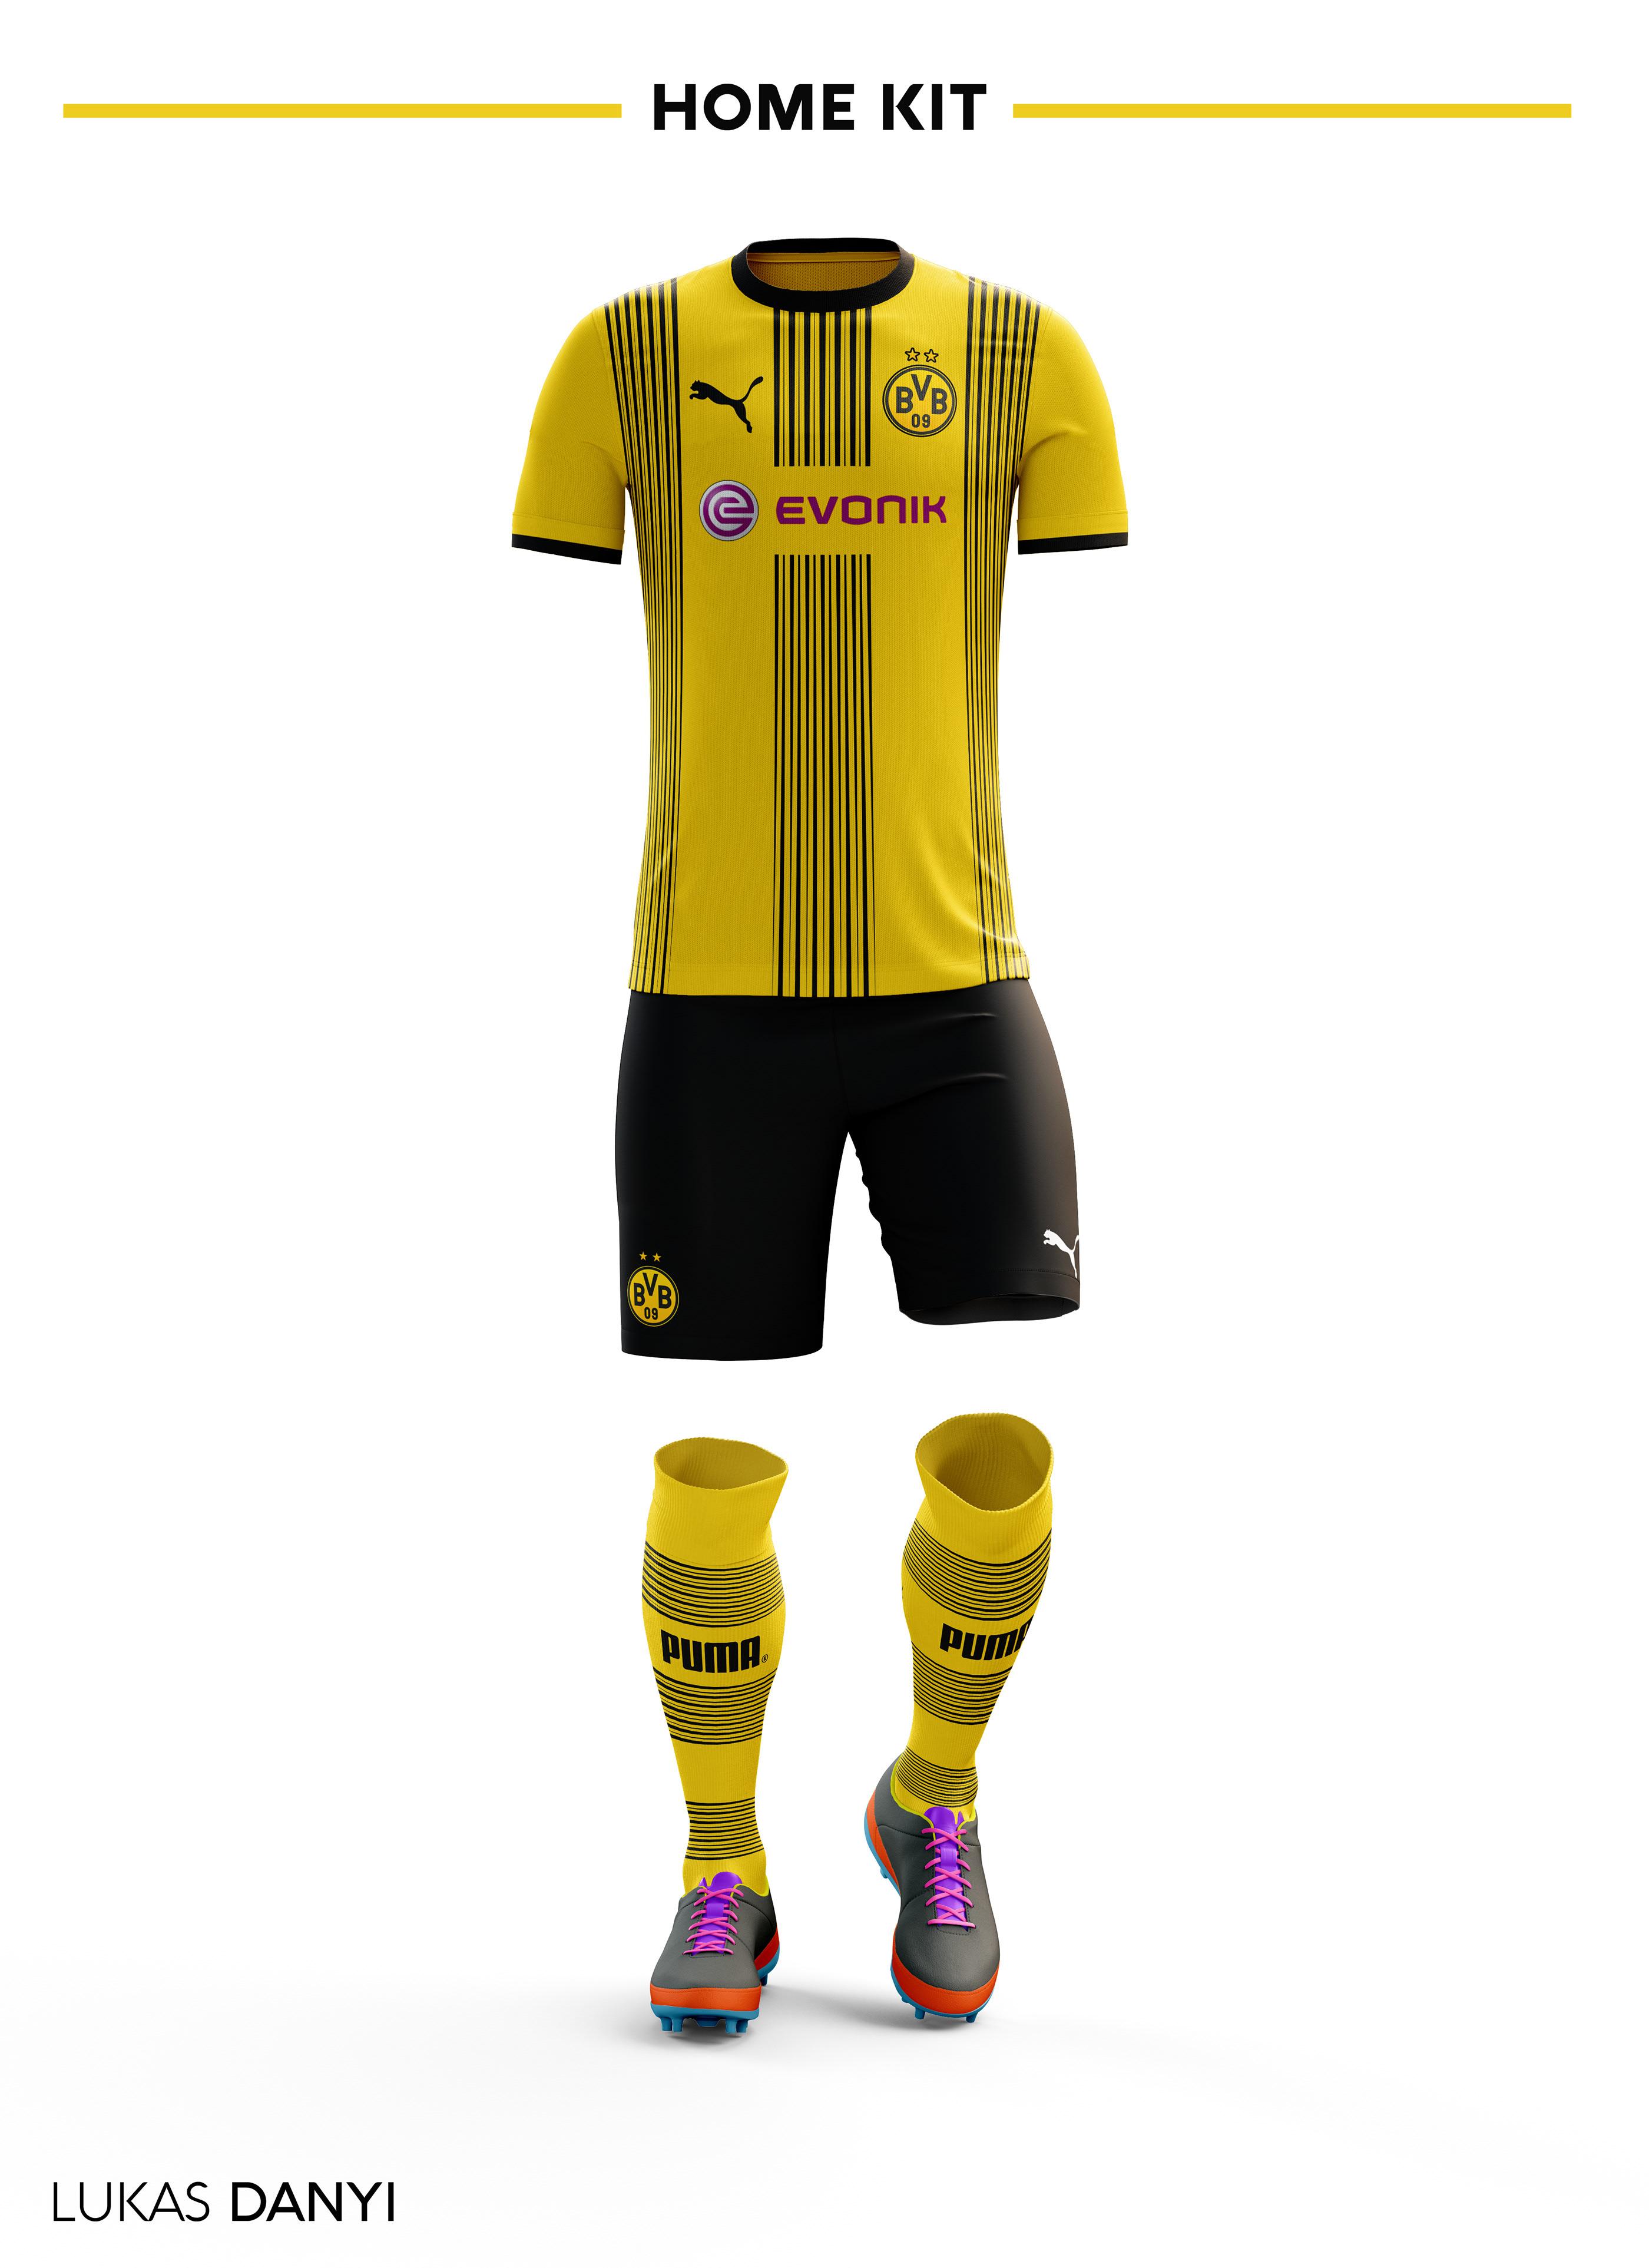 80e504f79 Borussia Dortmund Football Kit 17/18. on Behance